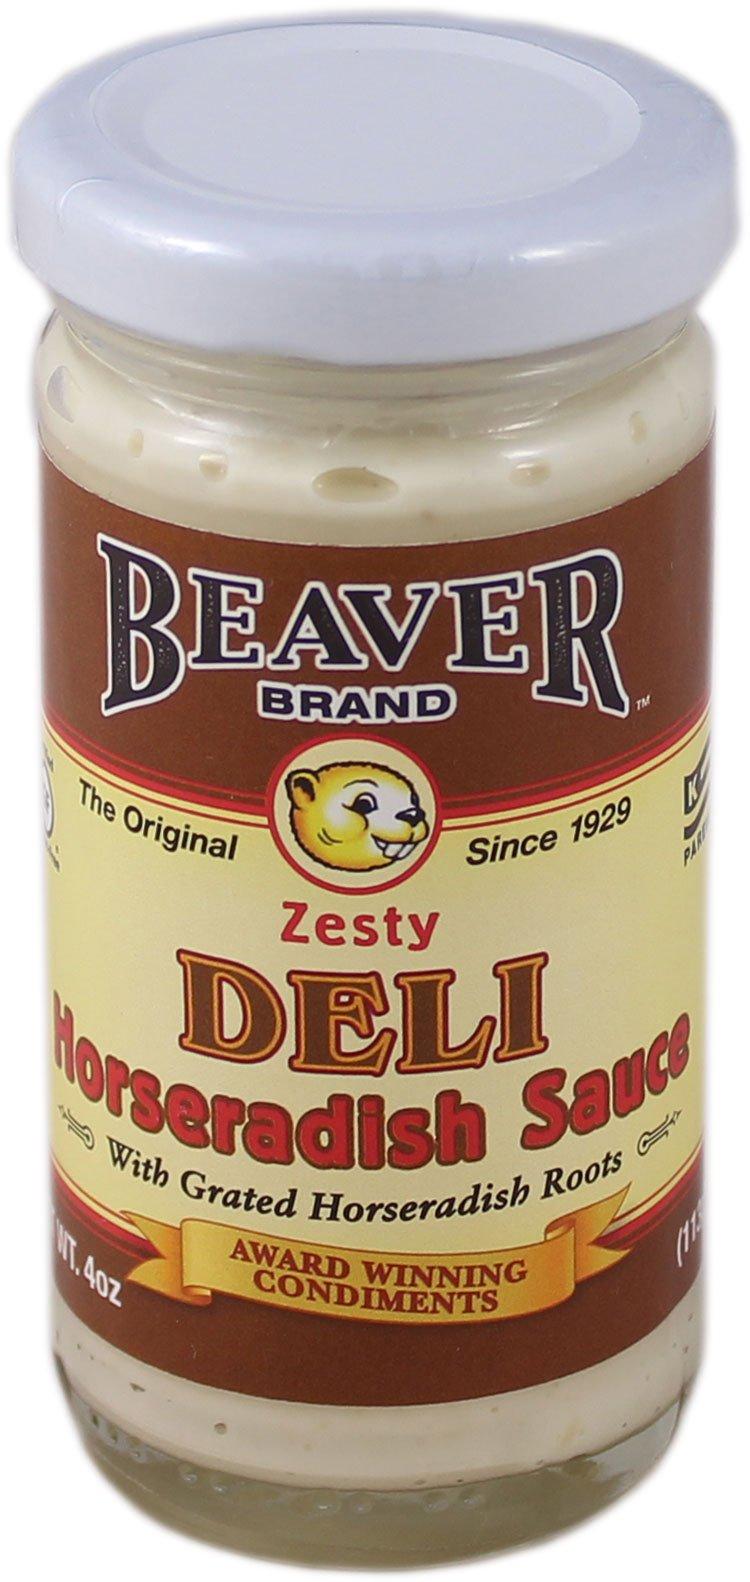 Beaver Brand Horseradish Sauce Shop Horseradish Wasabi At H E B